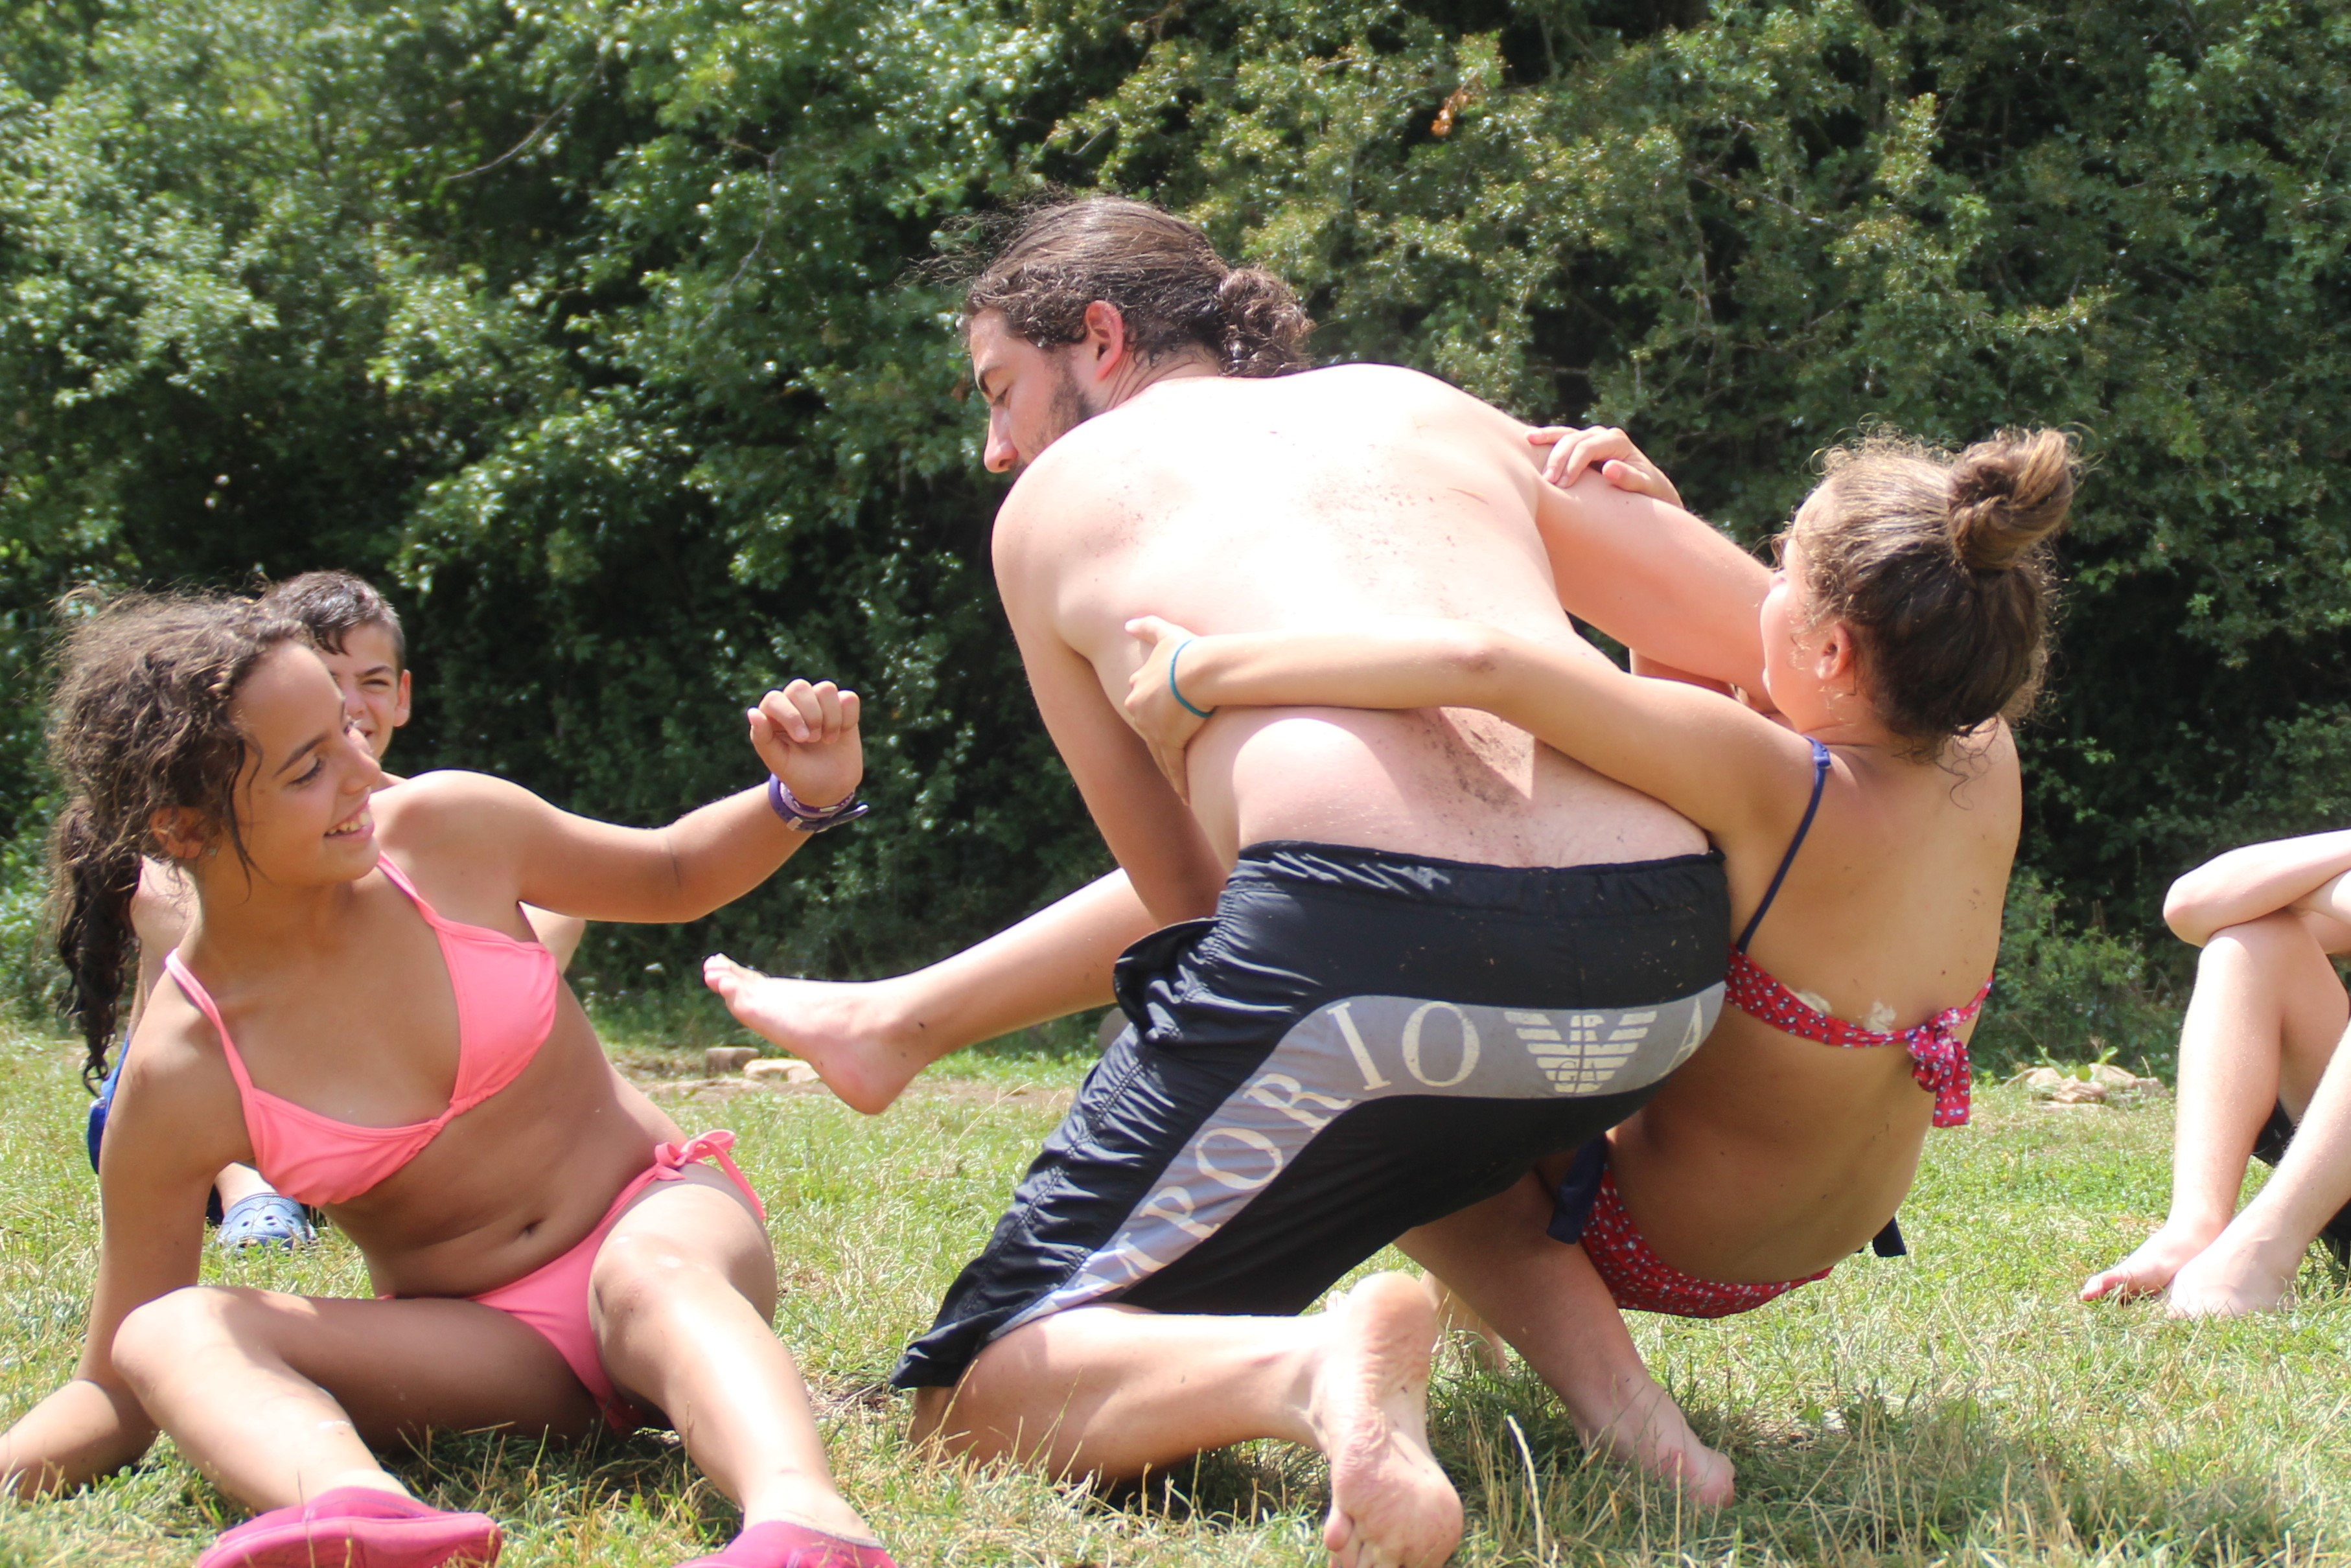 15-16 - Grupo - Campamento de verano - P181